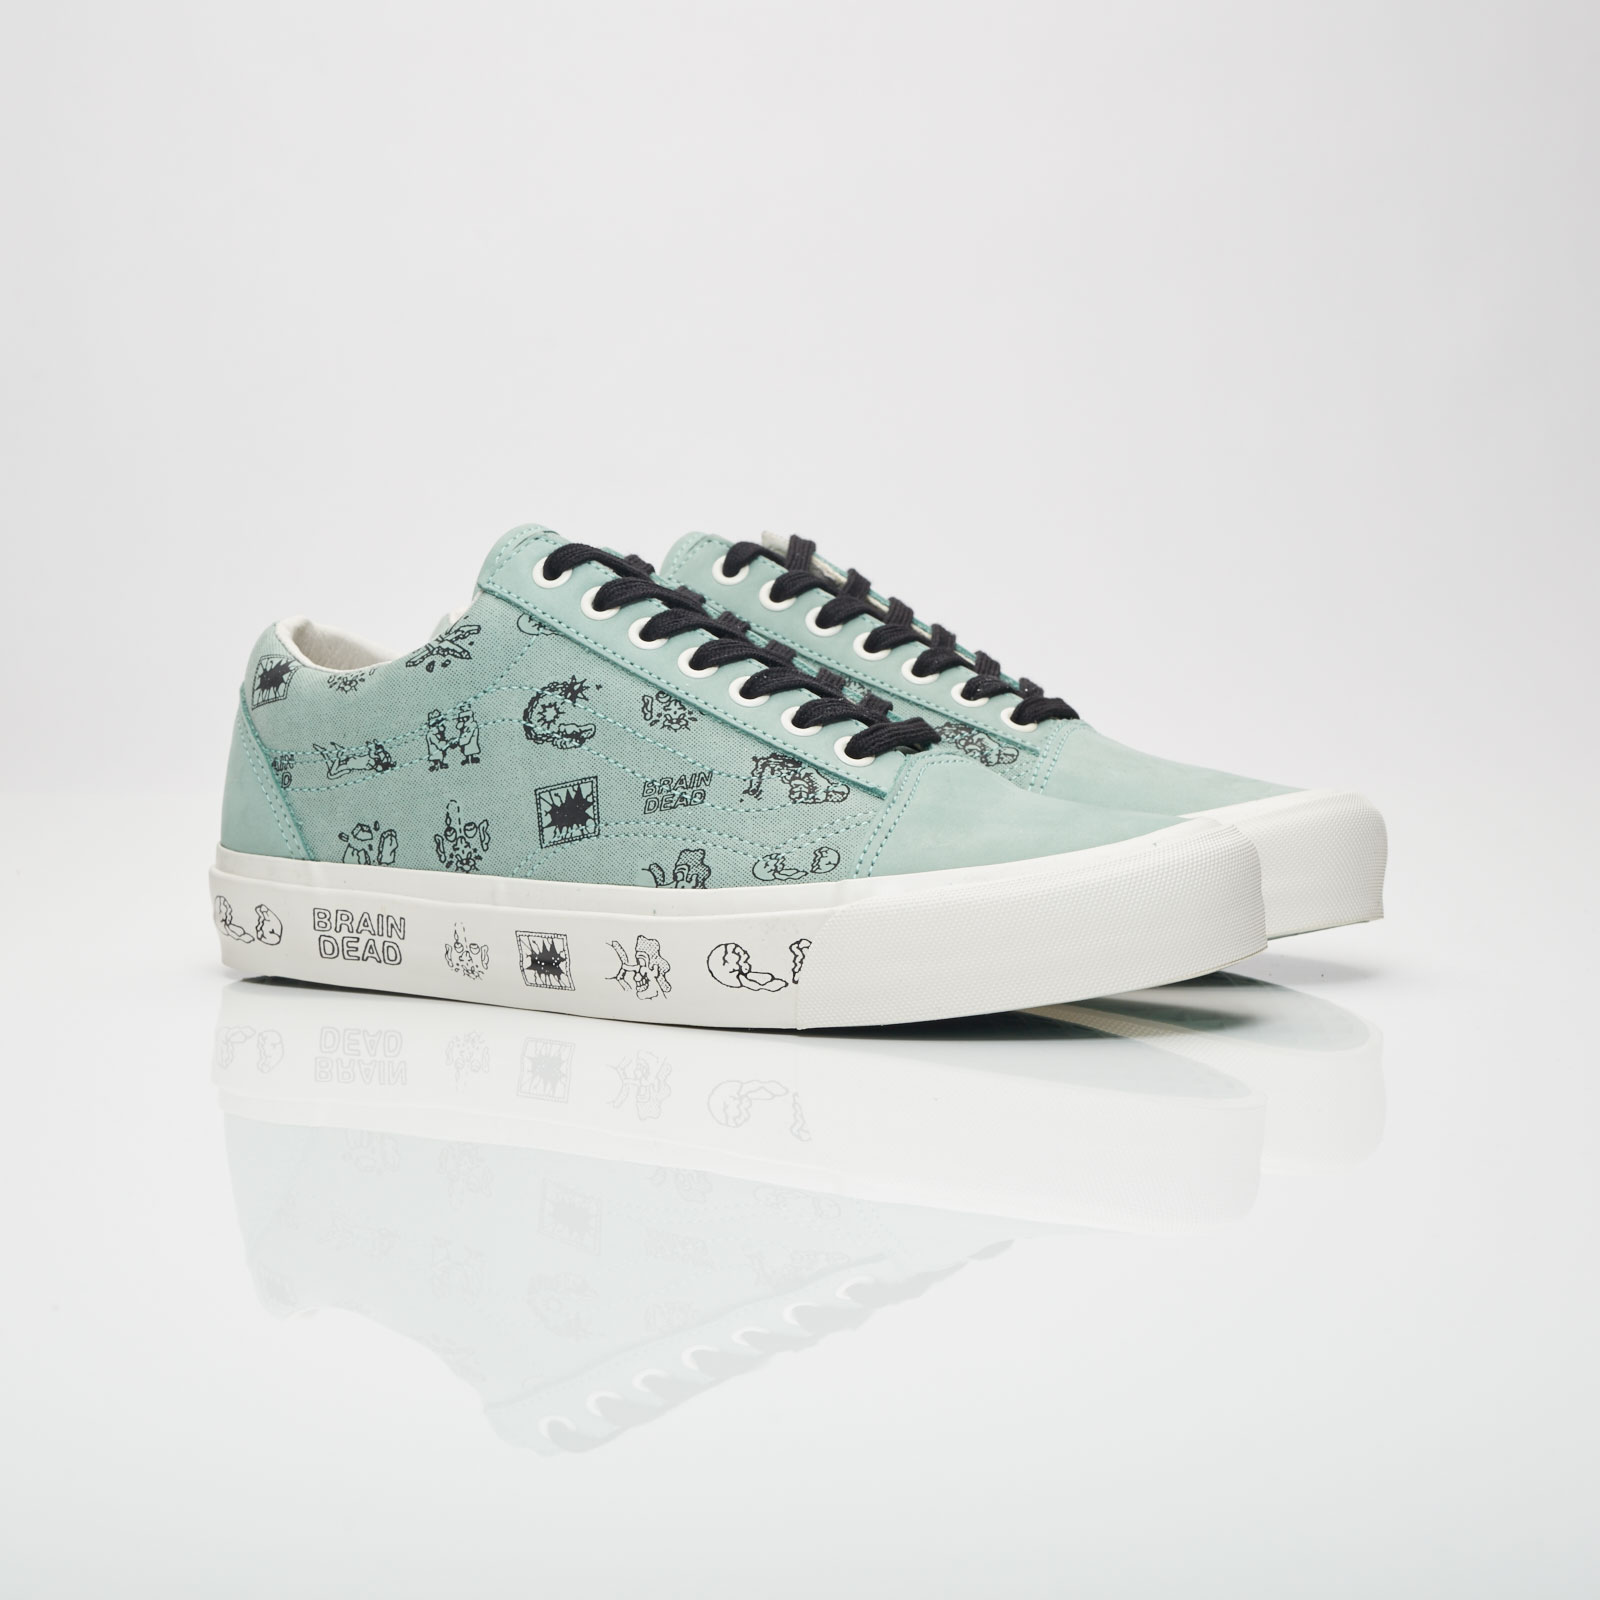 f4e44d3b6aa Vans UA Old Skool LX x Brain Dead - Va38g6n9e - Sneakersnstuff ...